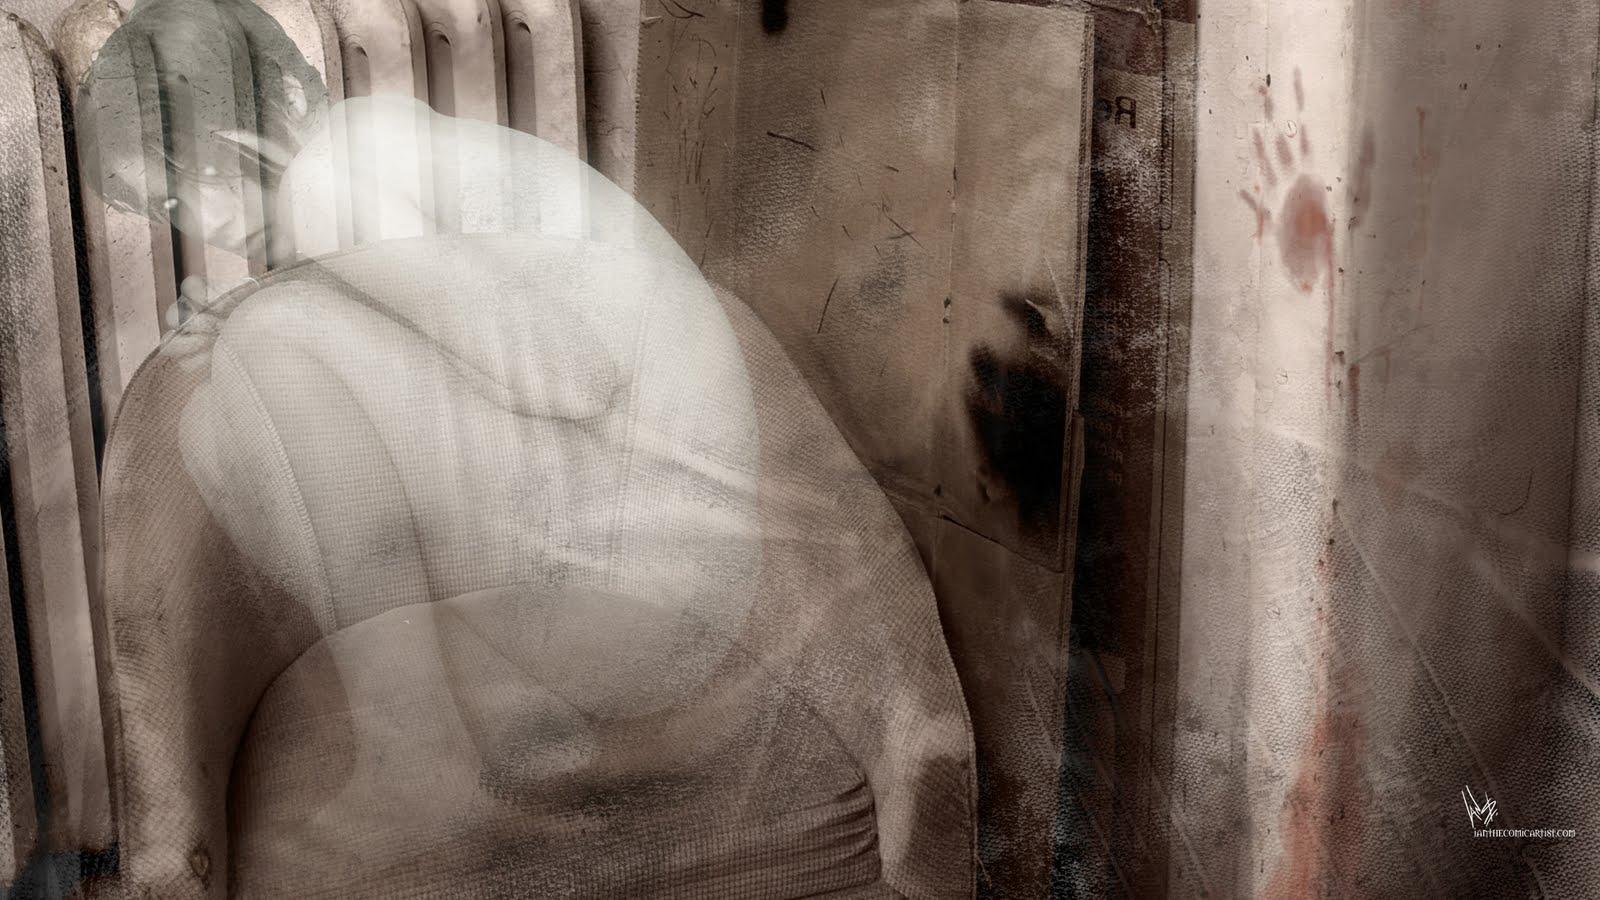 http://1.bp.blogspot.com/_zMwpozop3zg/TKFvdpw733I/AAAAAAAABmU/KAsiNh1r6-I/s1600/P1011428v2+wallpaper+1920x1080.jpg